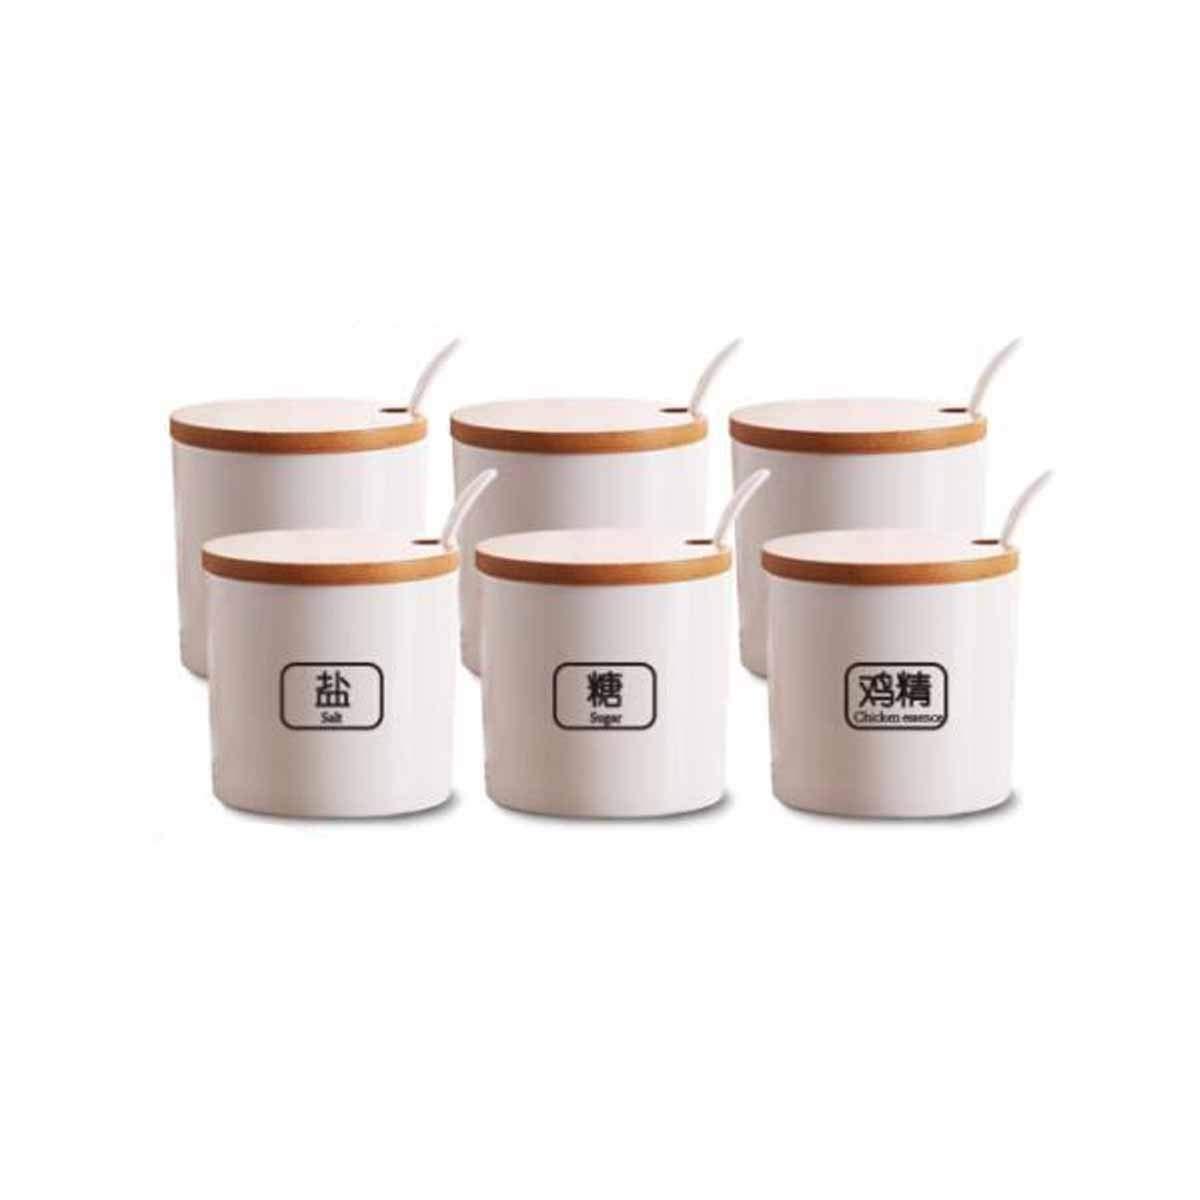 MINGRUIGONGMAO Seasoning Box, Multi-function Kitchen Salt And Sugar Storage Box, Creative Seasoning Box With Lid, 4/6/8 Jar With Spoon Spoon Box Plush toys (Size : 6) by MINGRUIGONGMAO